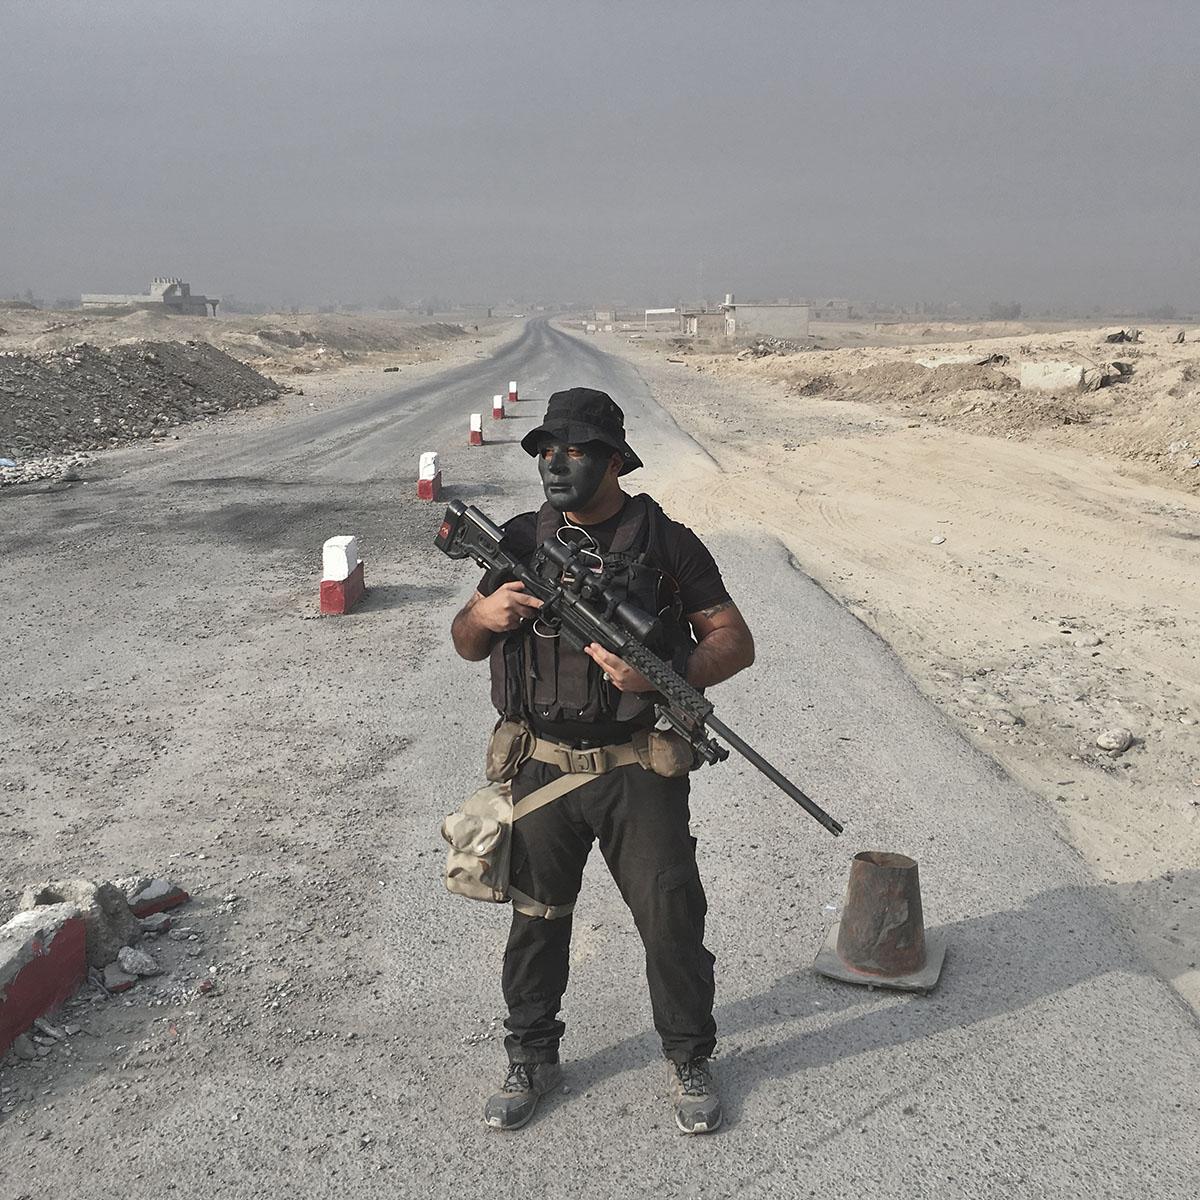 Riyad Jaffar, 27, from Baghdad, Iraq, an army sniper, mans a checkpoint on the outskirts of Qayara, south of Mosul, Iraq, Oct. 26, 2016.